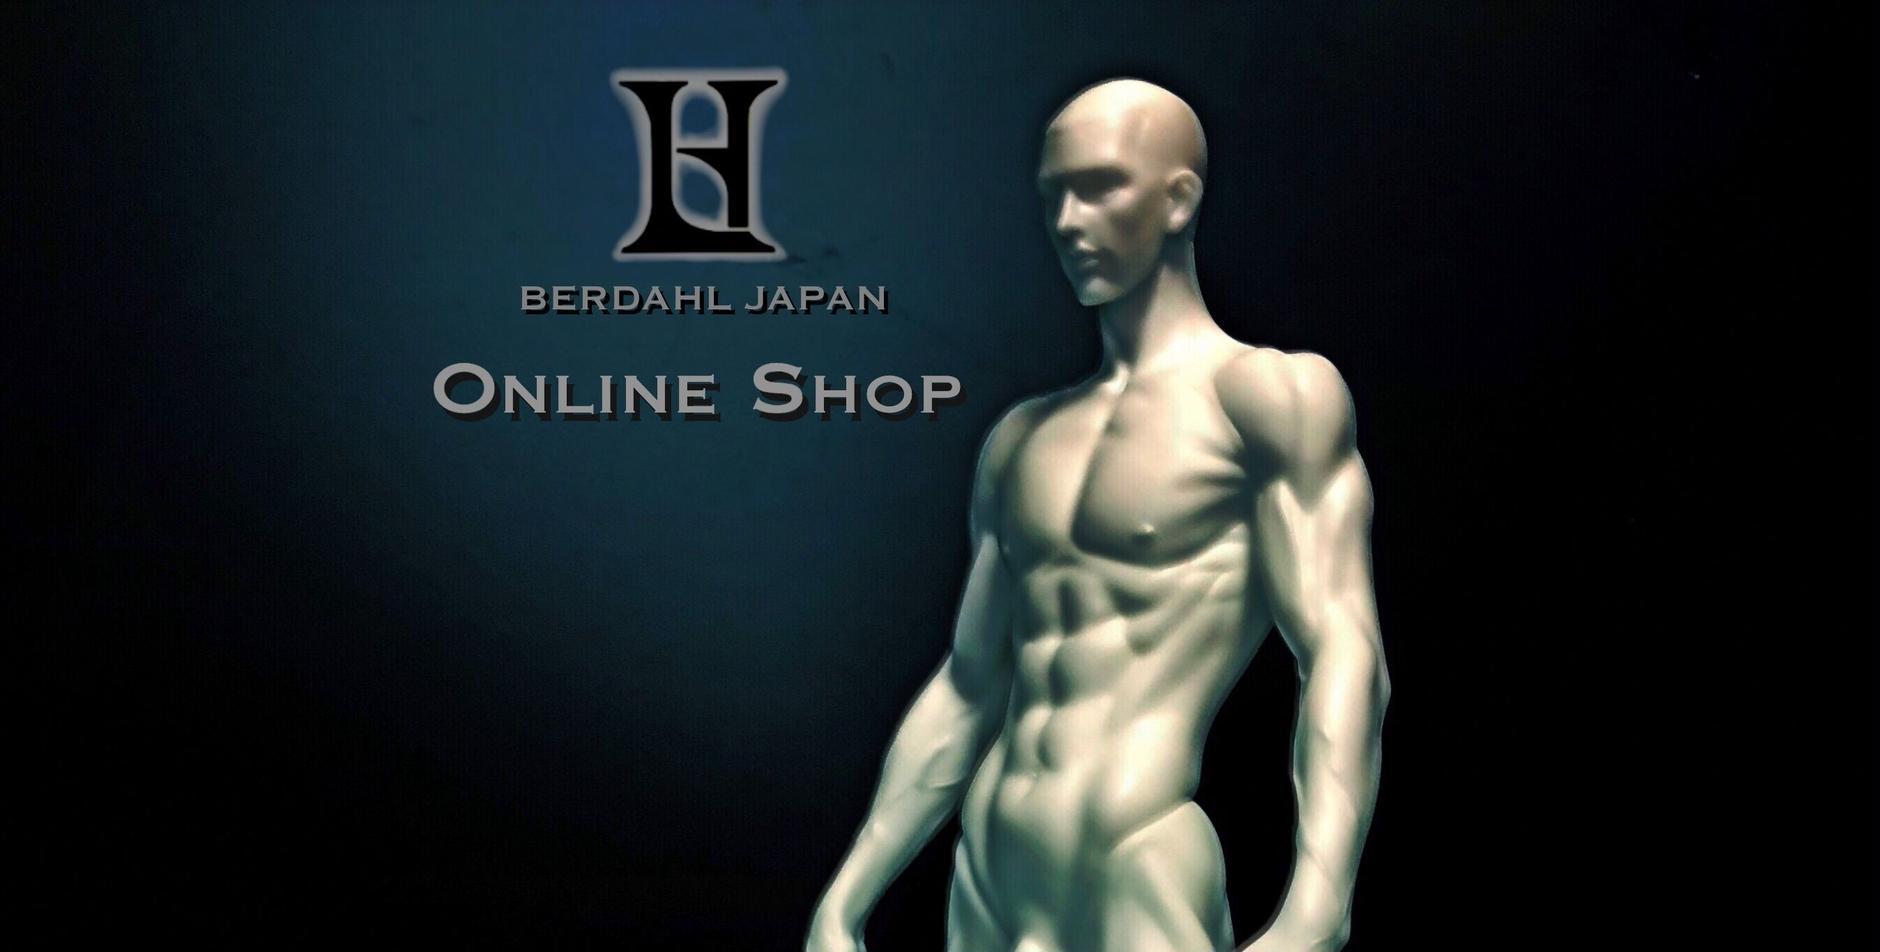 BERDAHL JAPAN  Online Shop